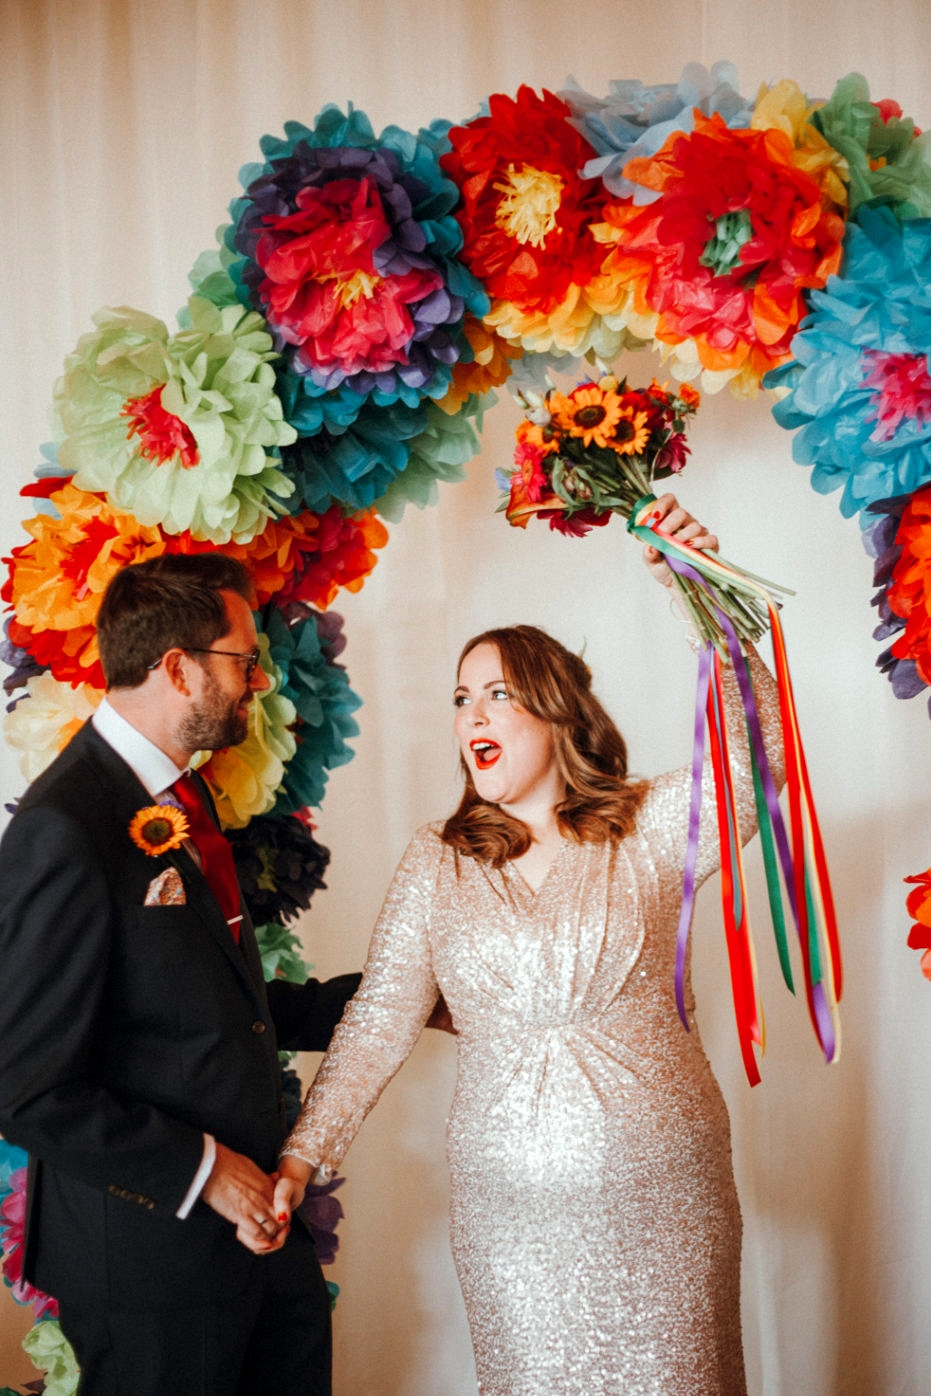 Colourful pompom wedding ceremony backdrop |